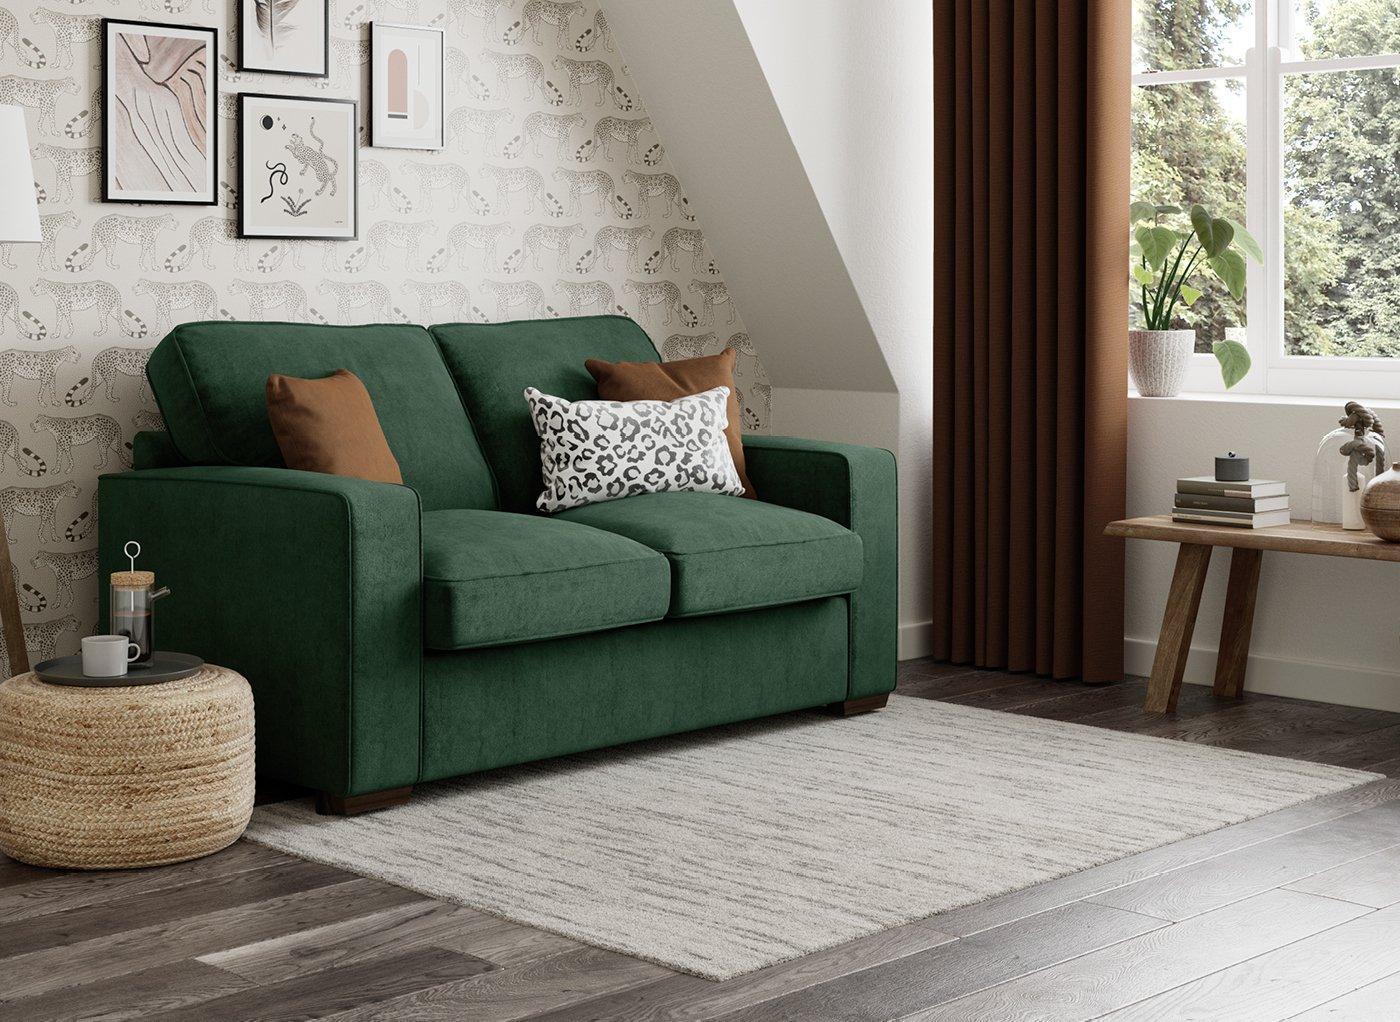 Odessa 2 Seater Sofa Bed Standard - Emerald Green 2 Seater